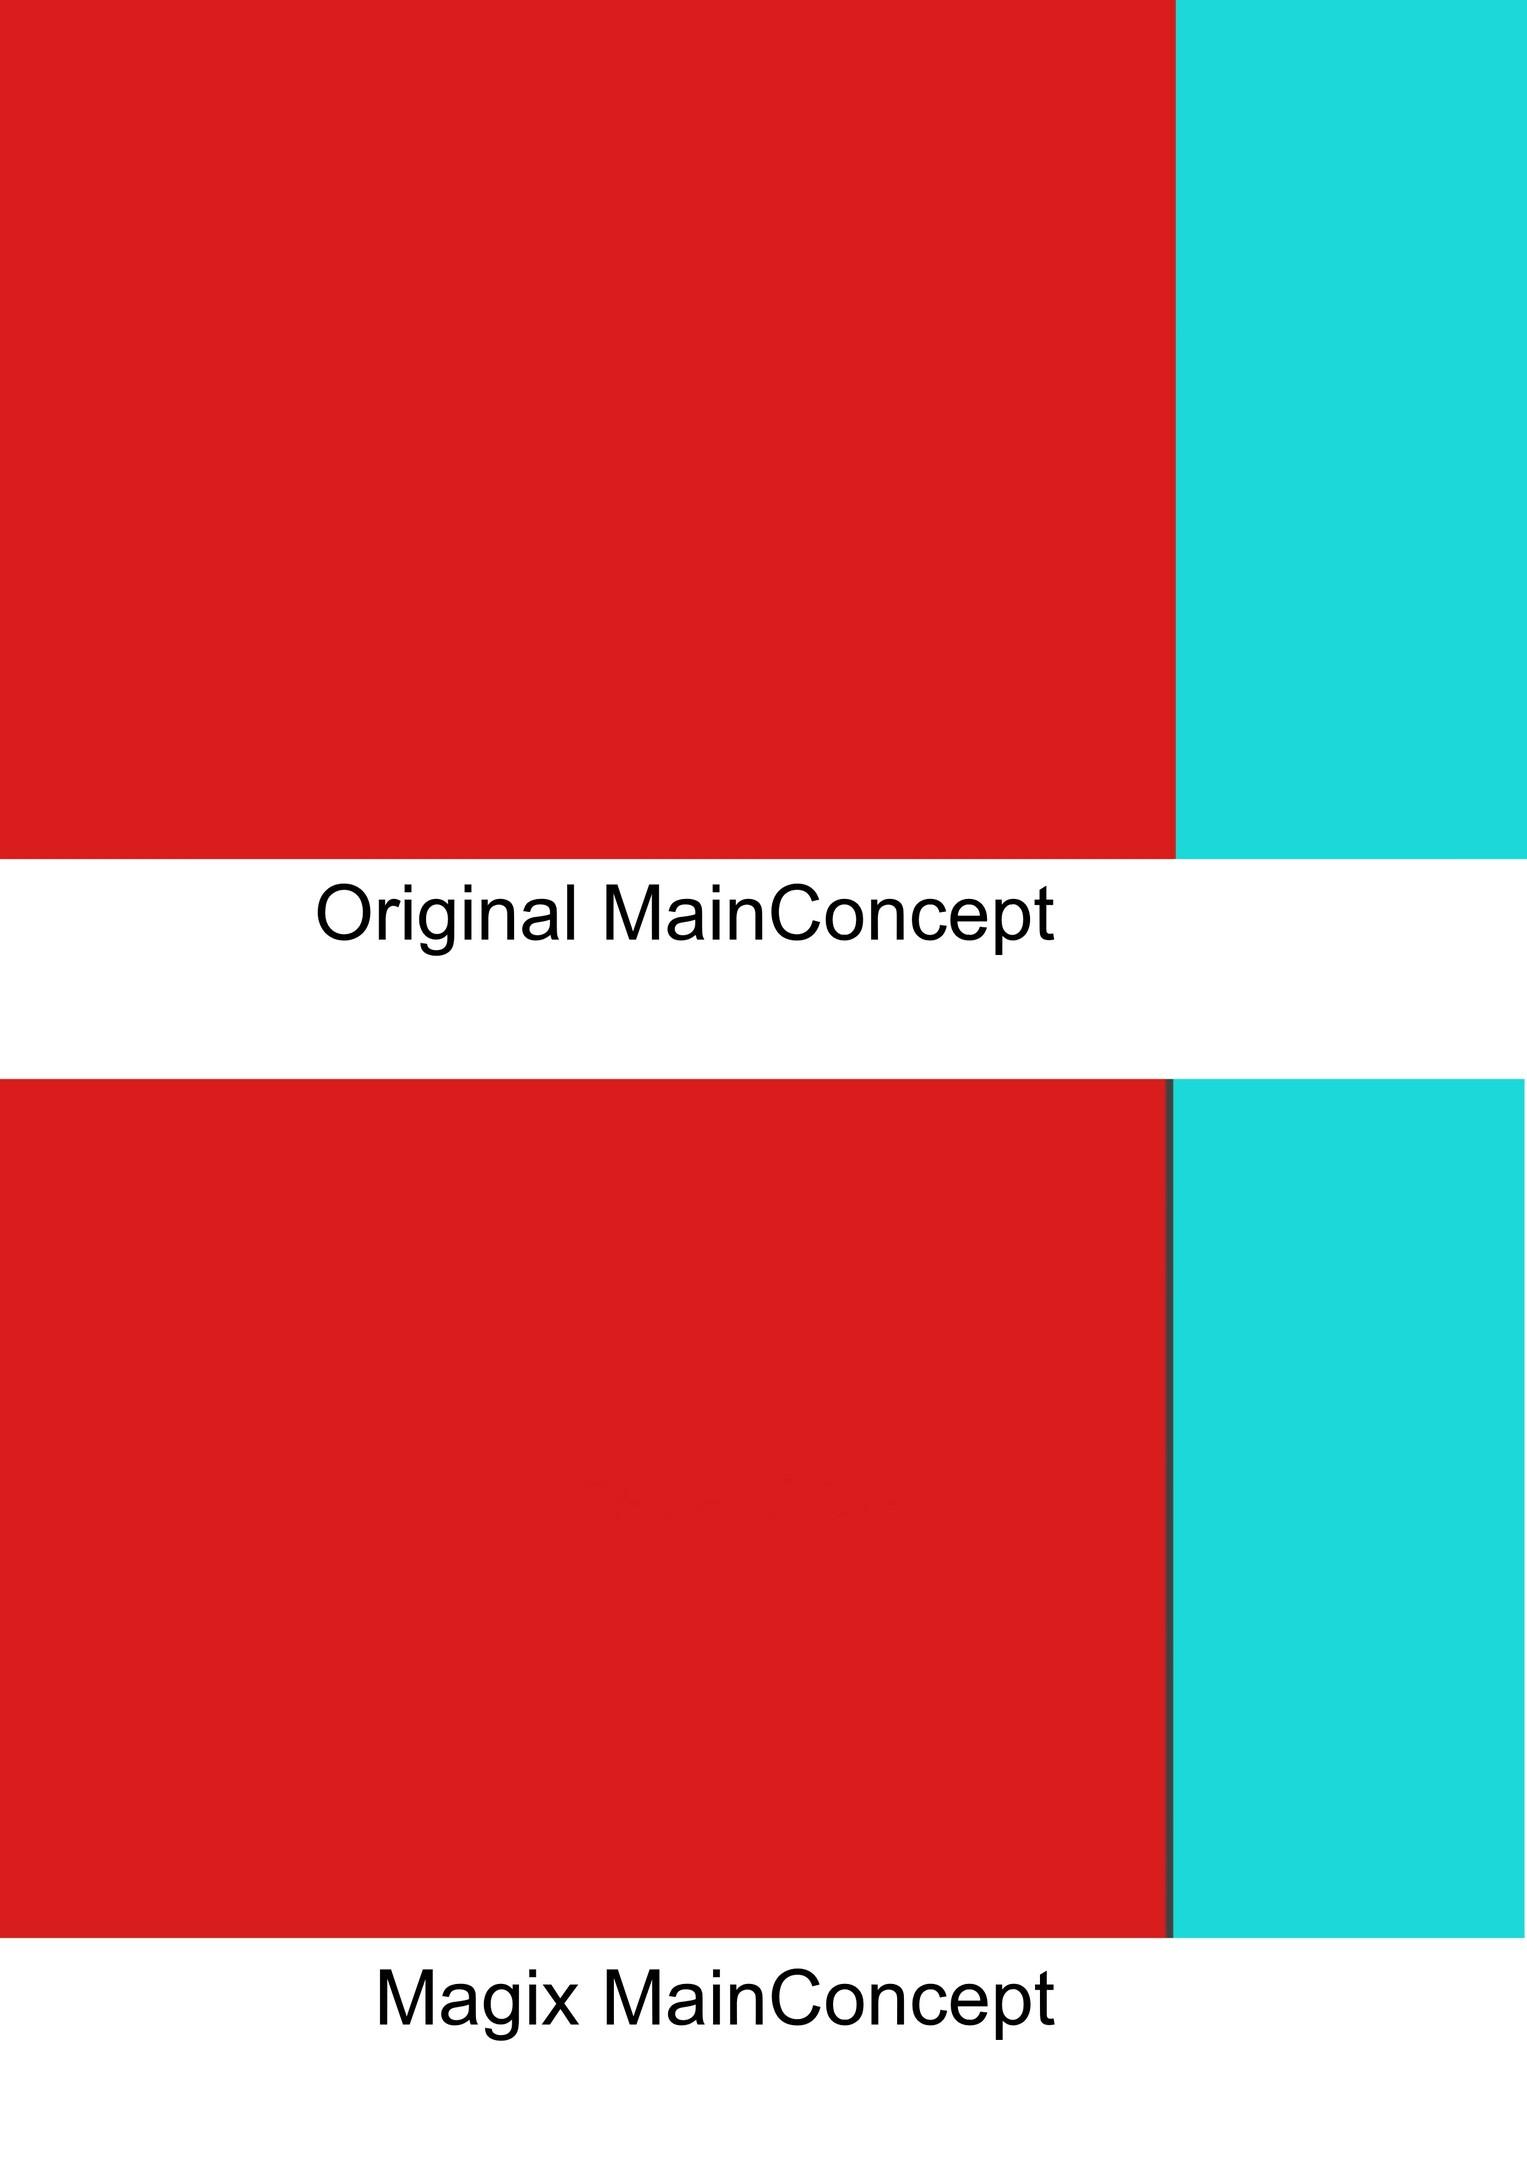 Magix Mainconcept AVC render quality problem